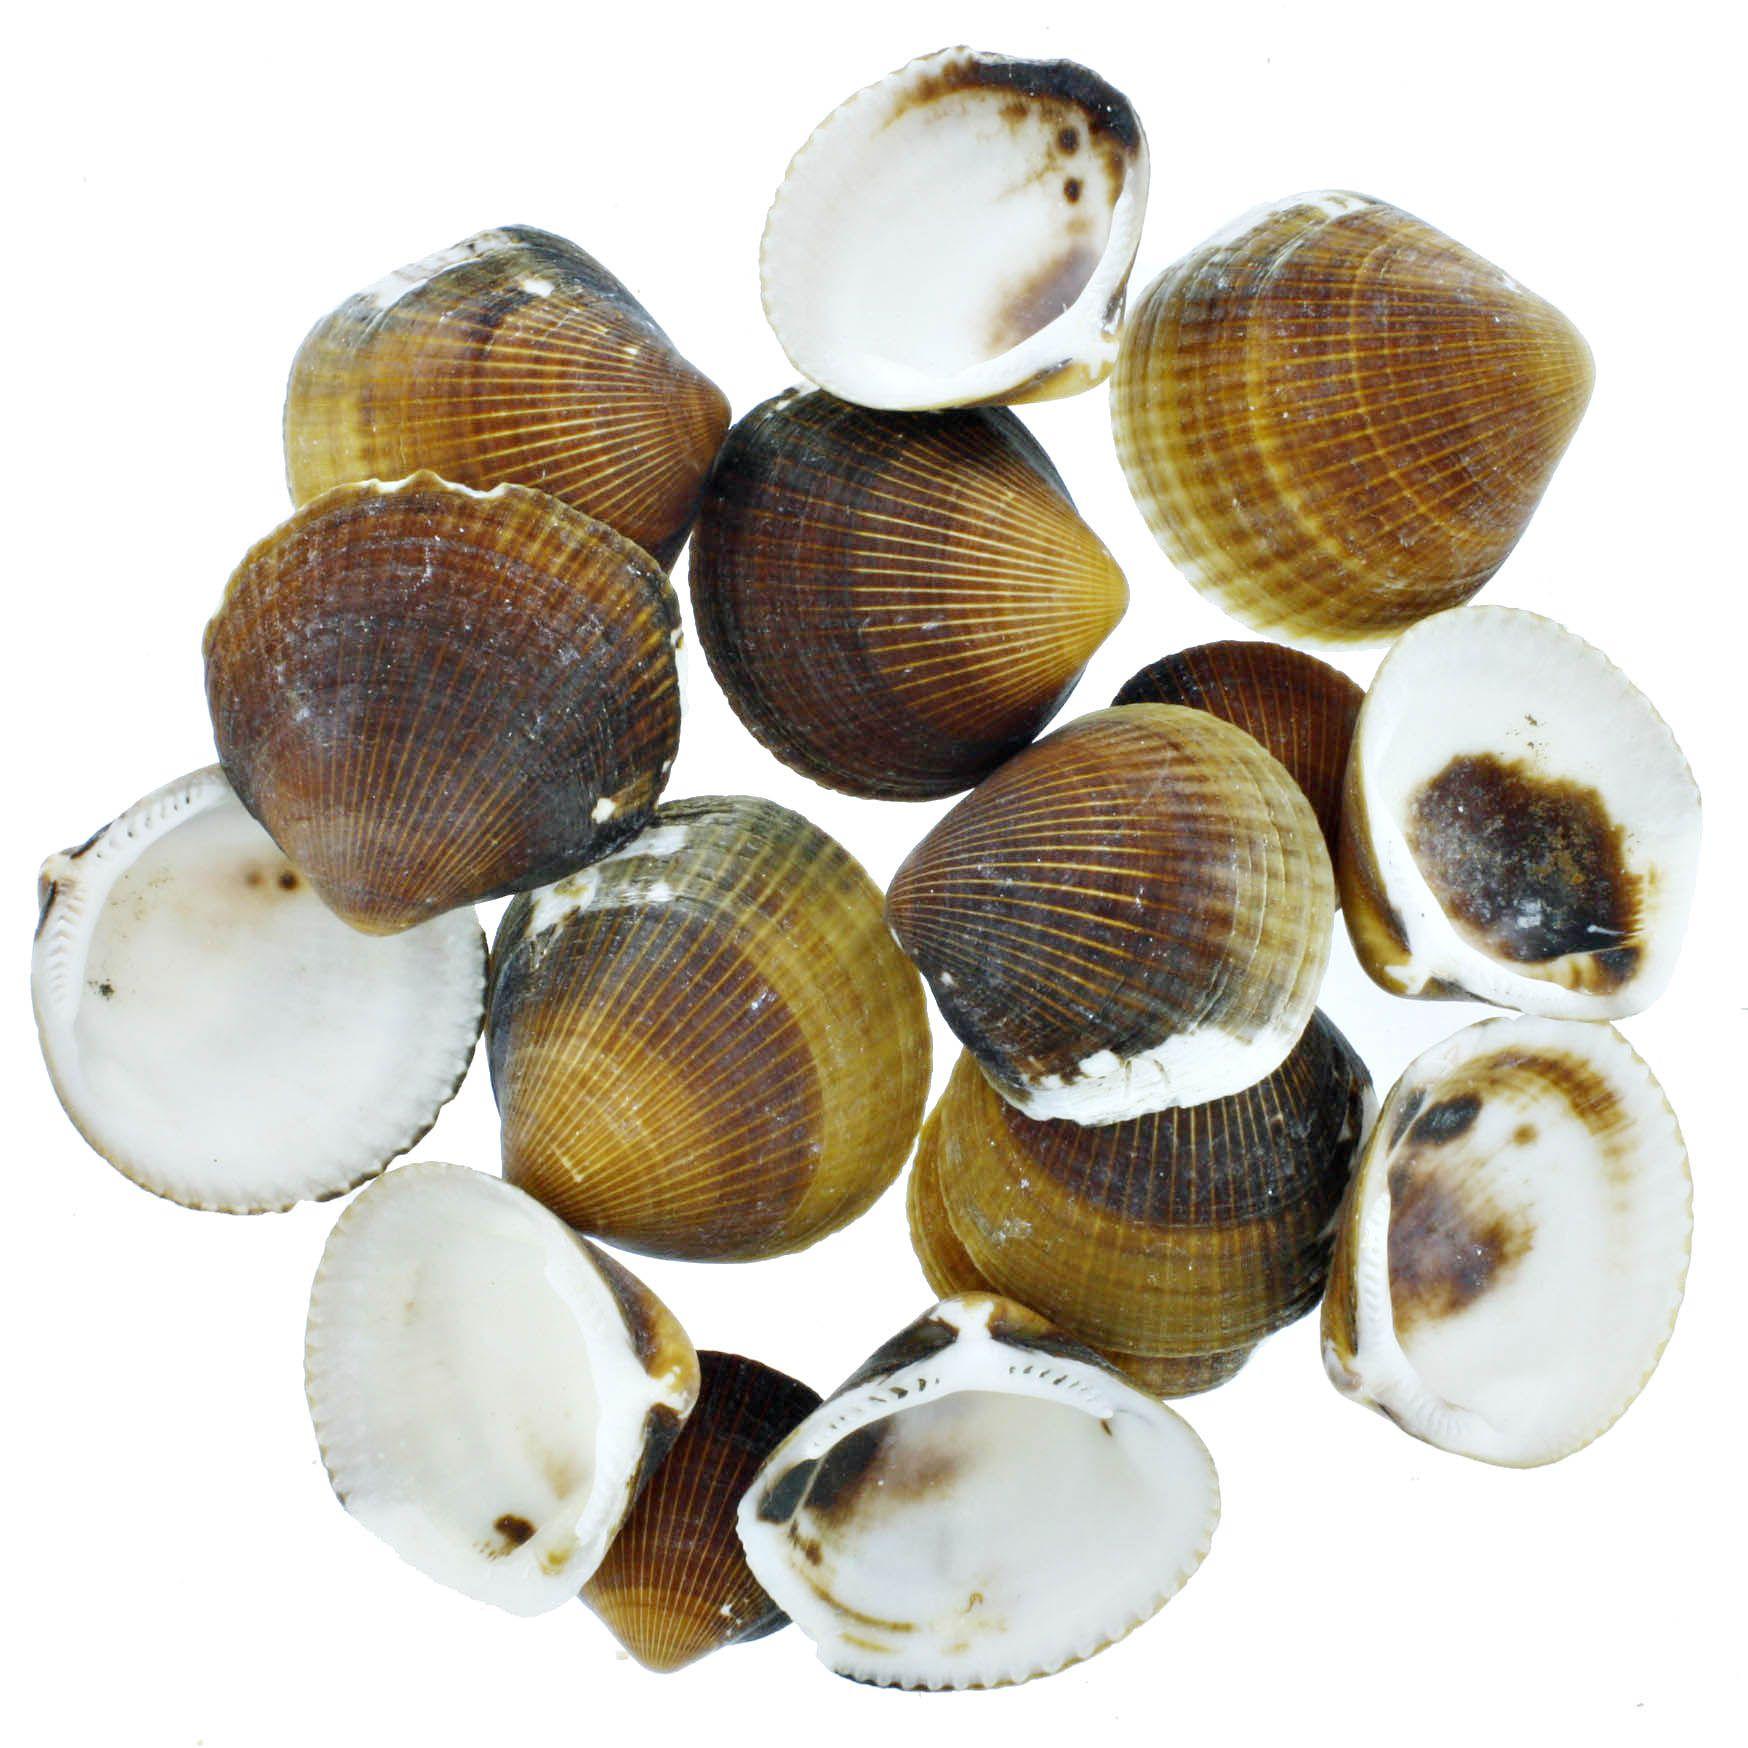 Concha - Brown Cockles (Glycymeris Reevei)  - Stéphanie Bijoux® - Peças para Bijuterias e Artesanato